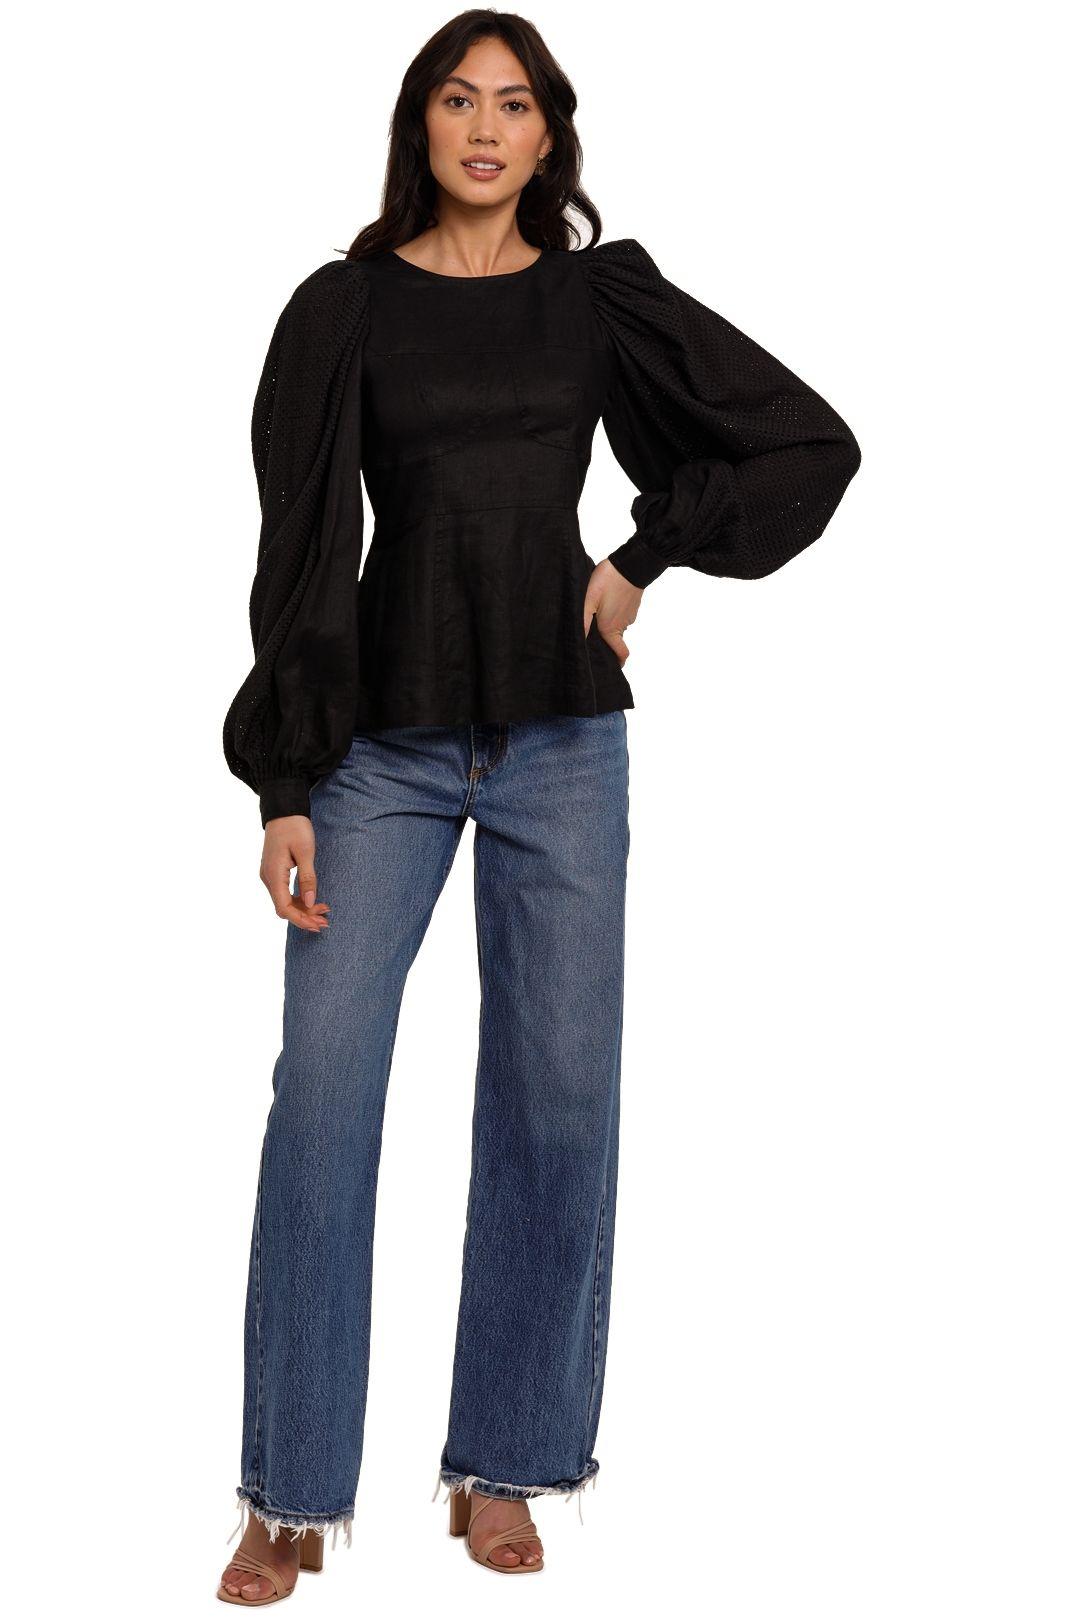 Joslin Reagan Linen Crochet Top Black balloon sleeve